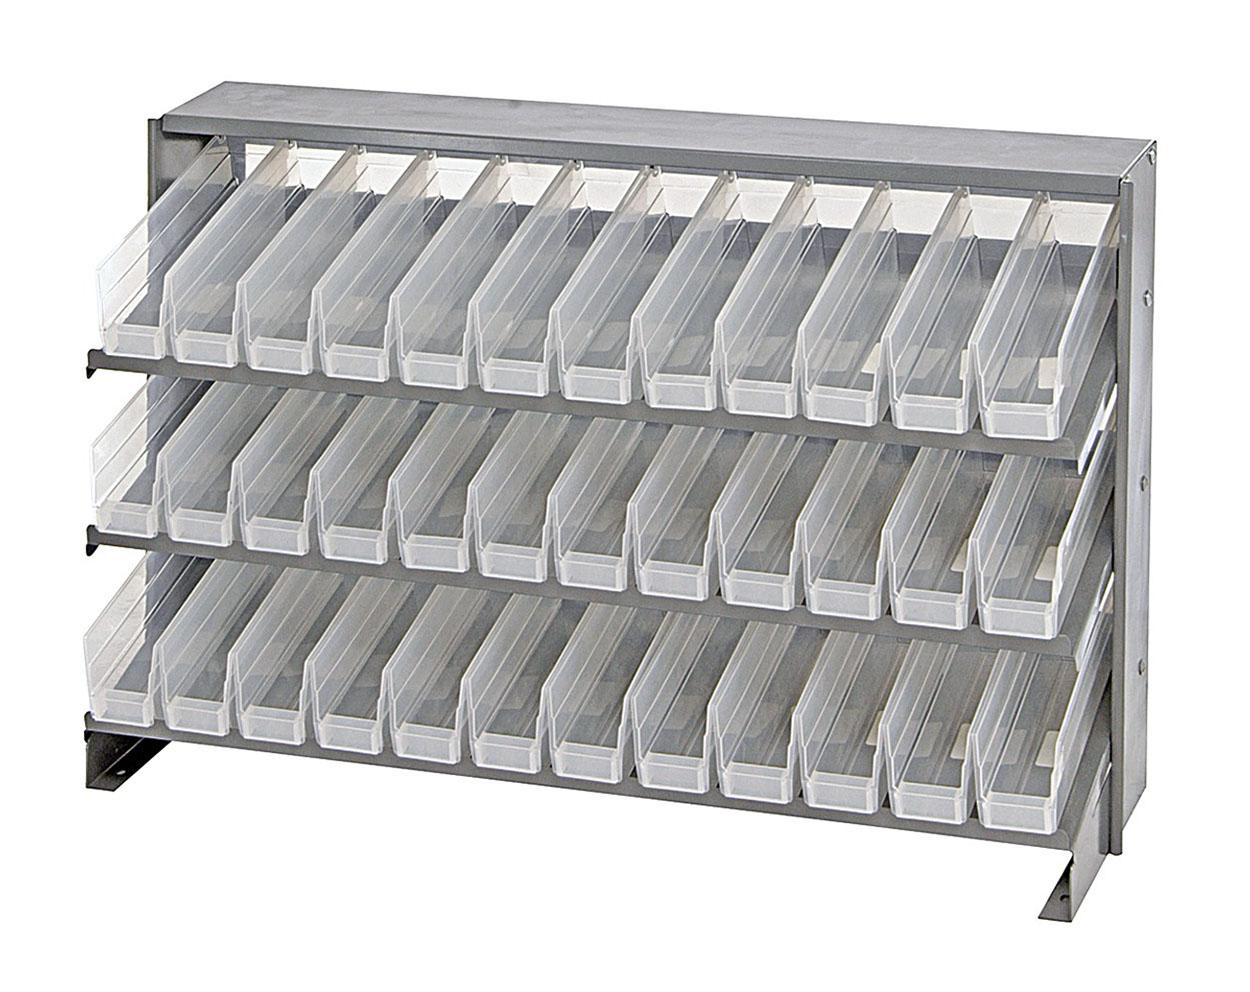 "QPRHA-100CL CLear-View Pick Rack Systems Bench Pick Racks 12-1/2"" X 36"" X 23"""